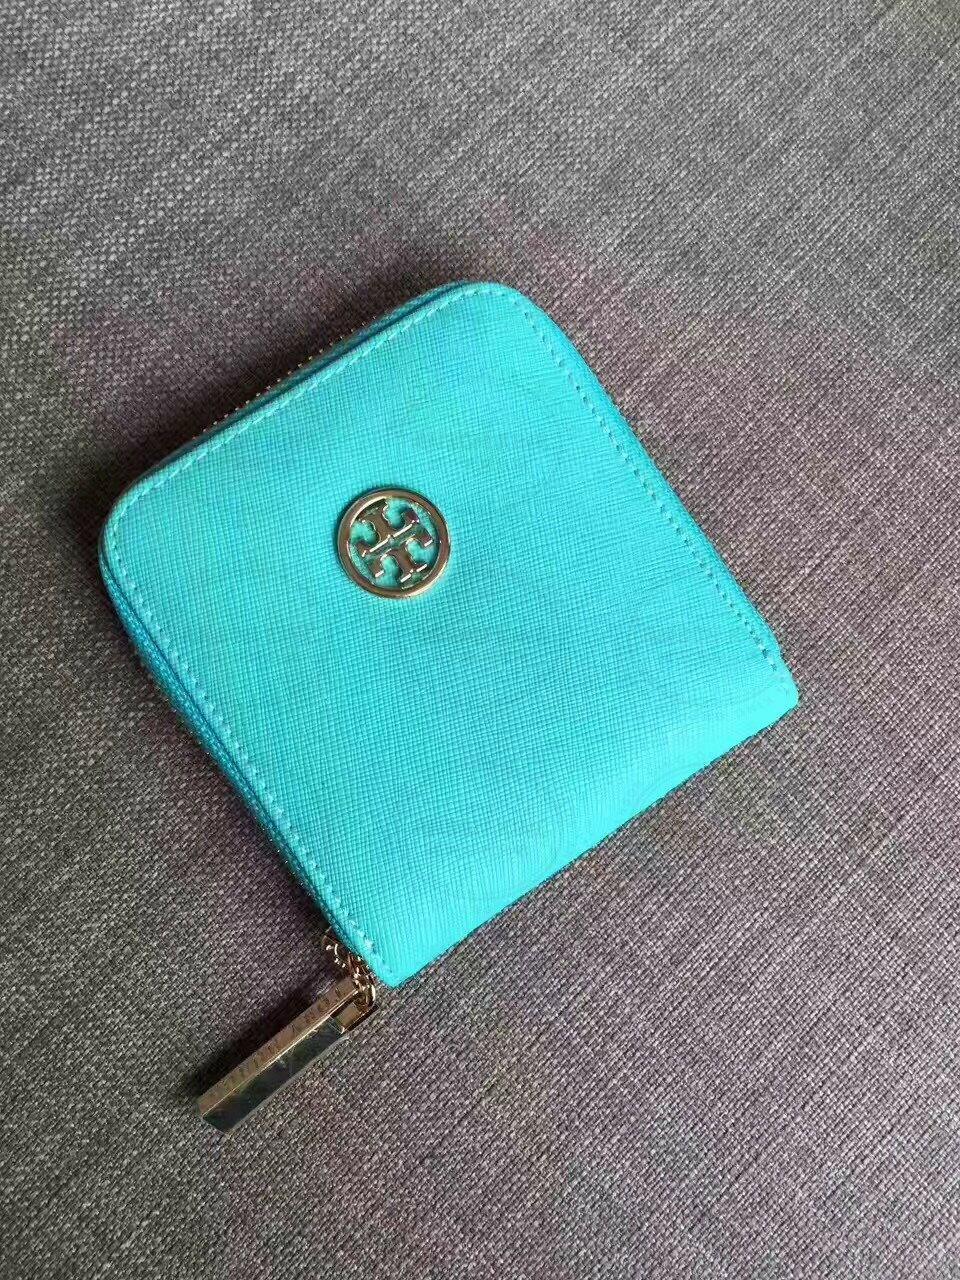 Outlet正品代購 Tory Burch TB 馬卡龍多色零錢包 天藍色 卡片包 證件包 錢包 皮包 有多色